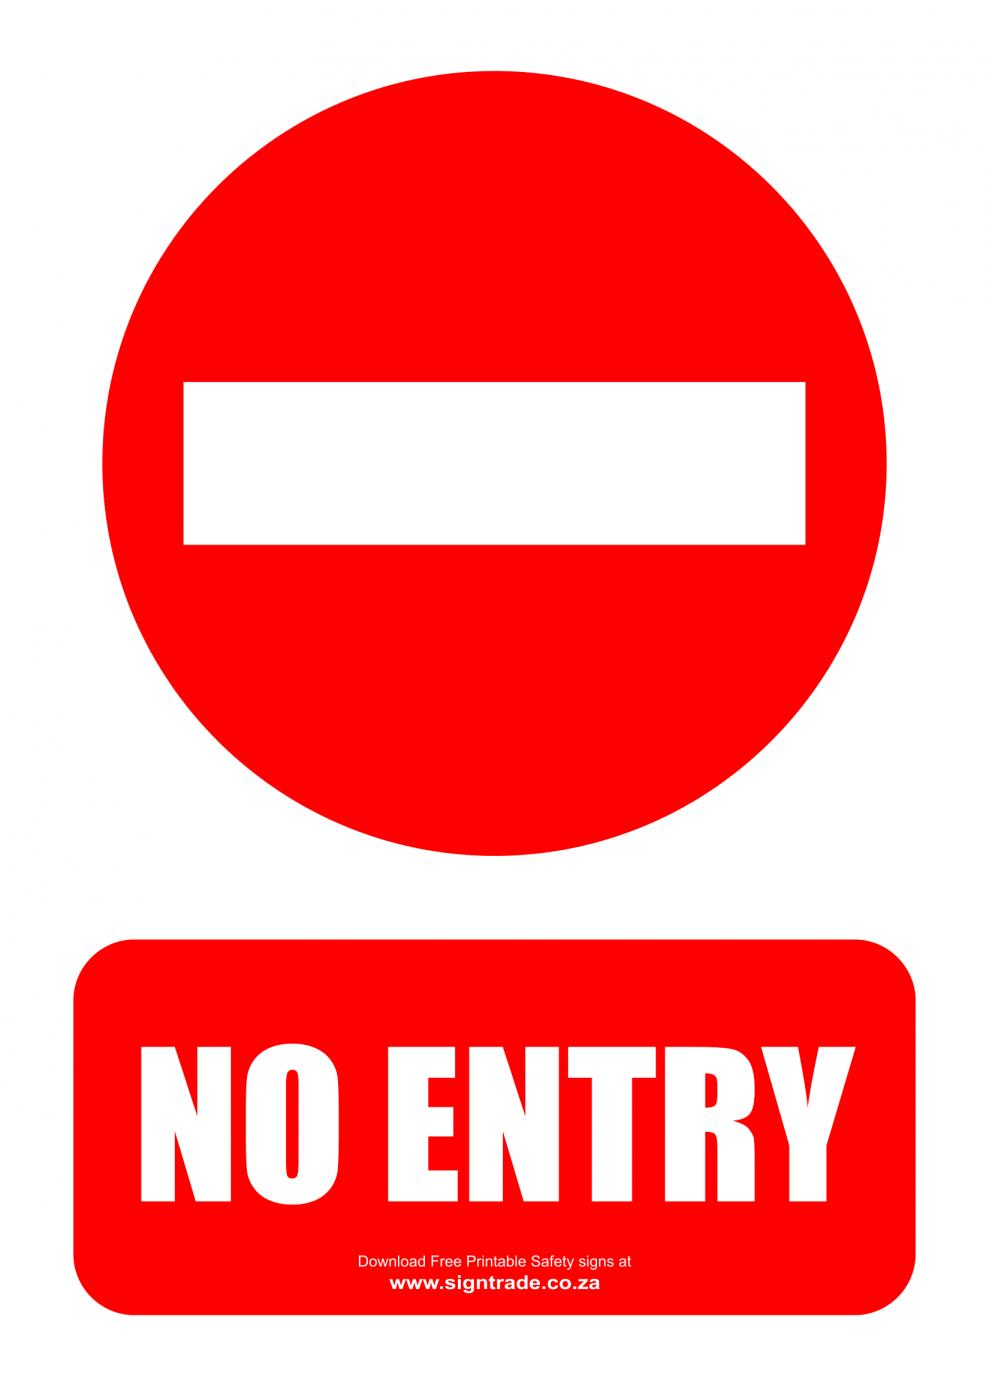 p_no_entry-1.png